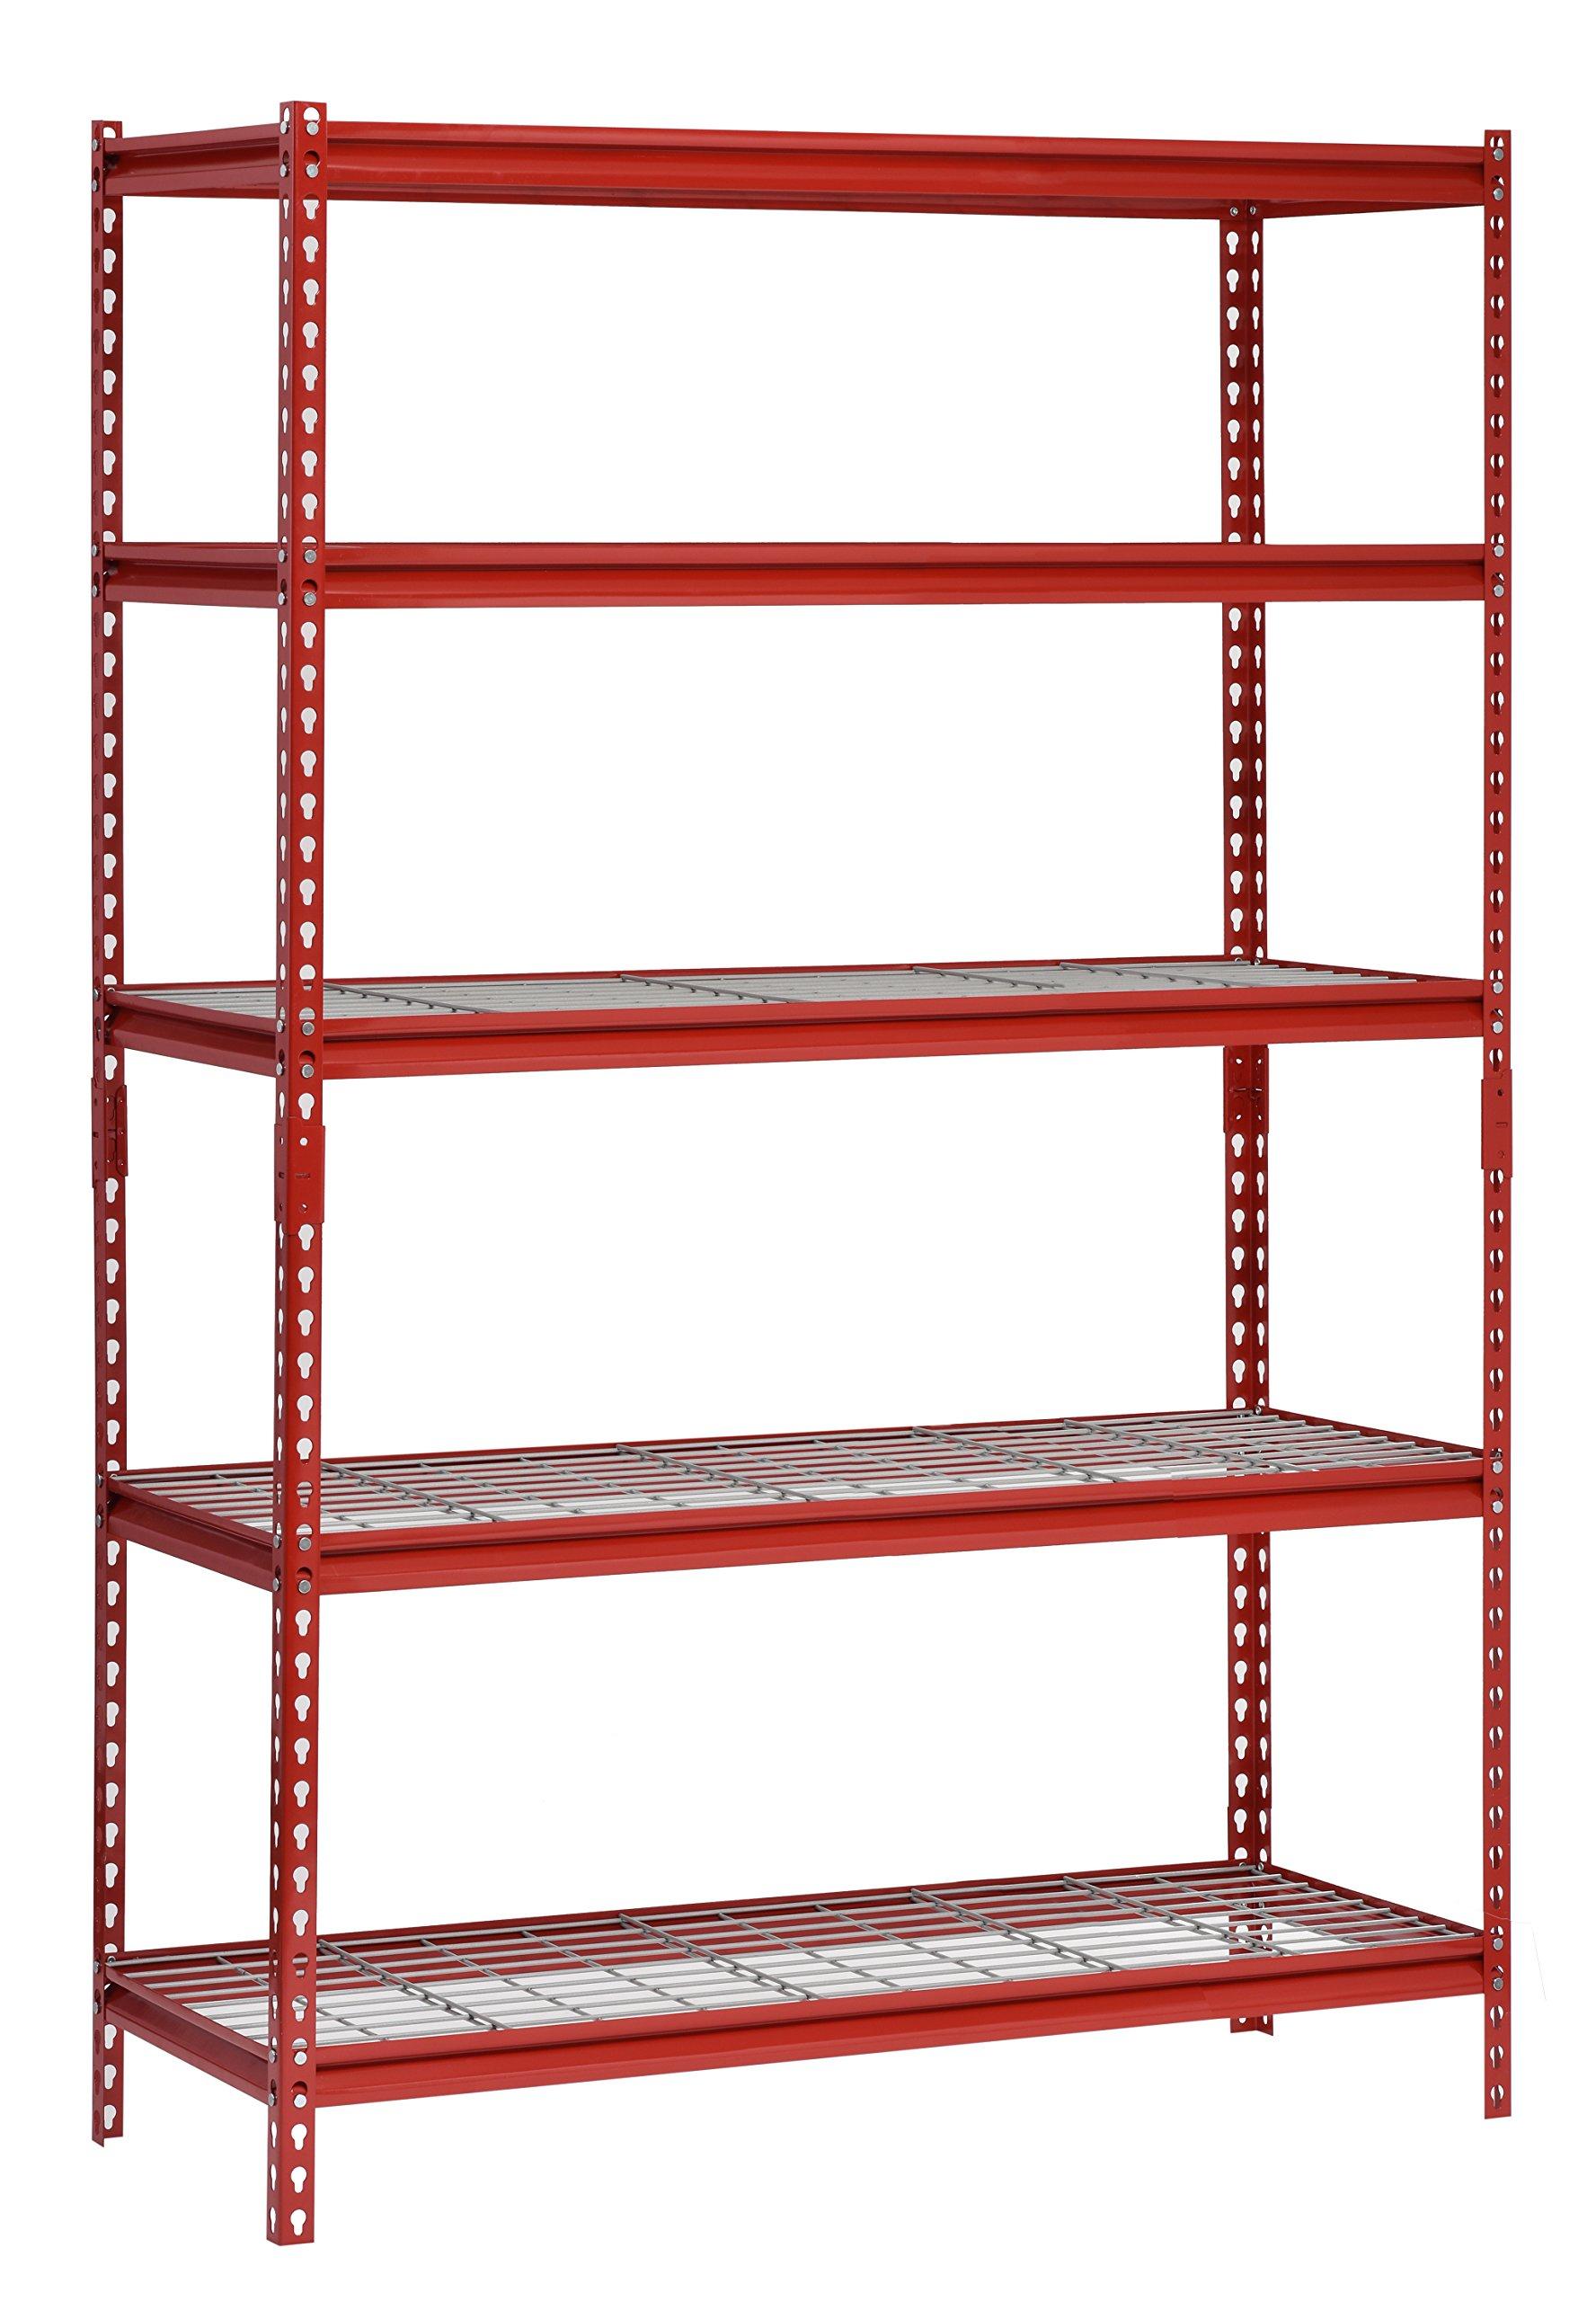 Muscle Rack UR482472WD5-R 5-Shelf Steel Shelving Unit, 48'' Width x 72'' Height x 24'' Length, Red by Muscle Rack